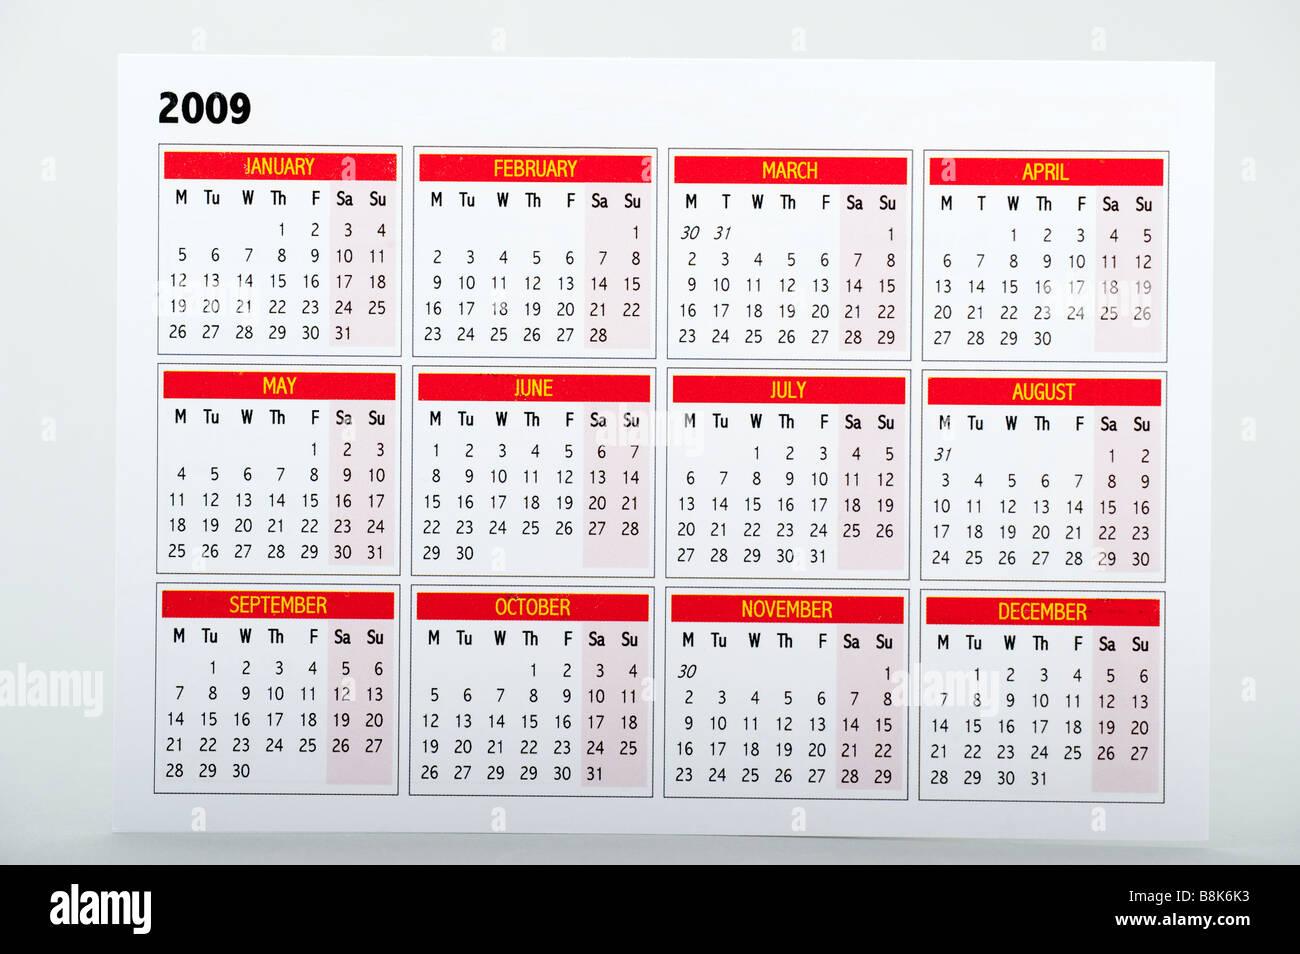 Small 2009 Calendar card - Stock Image